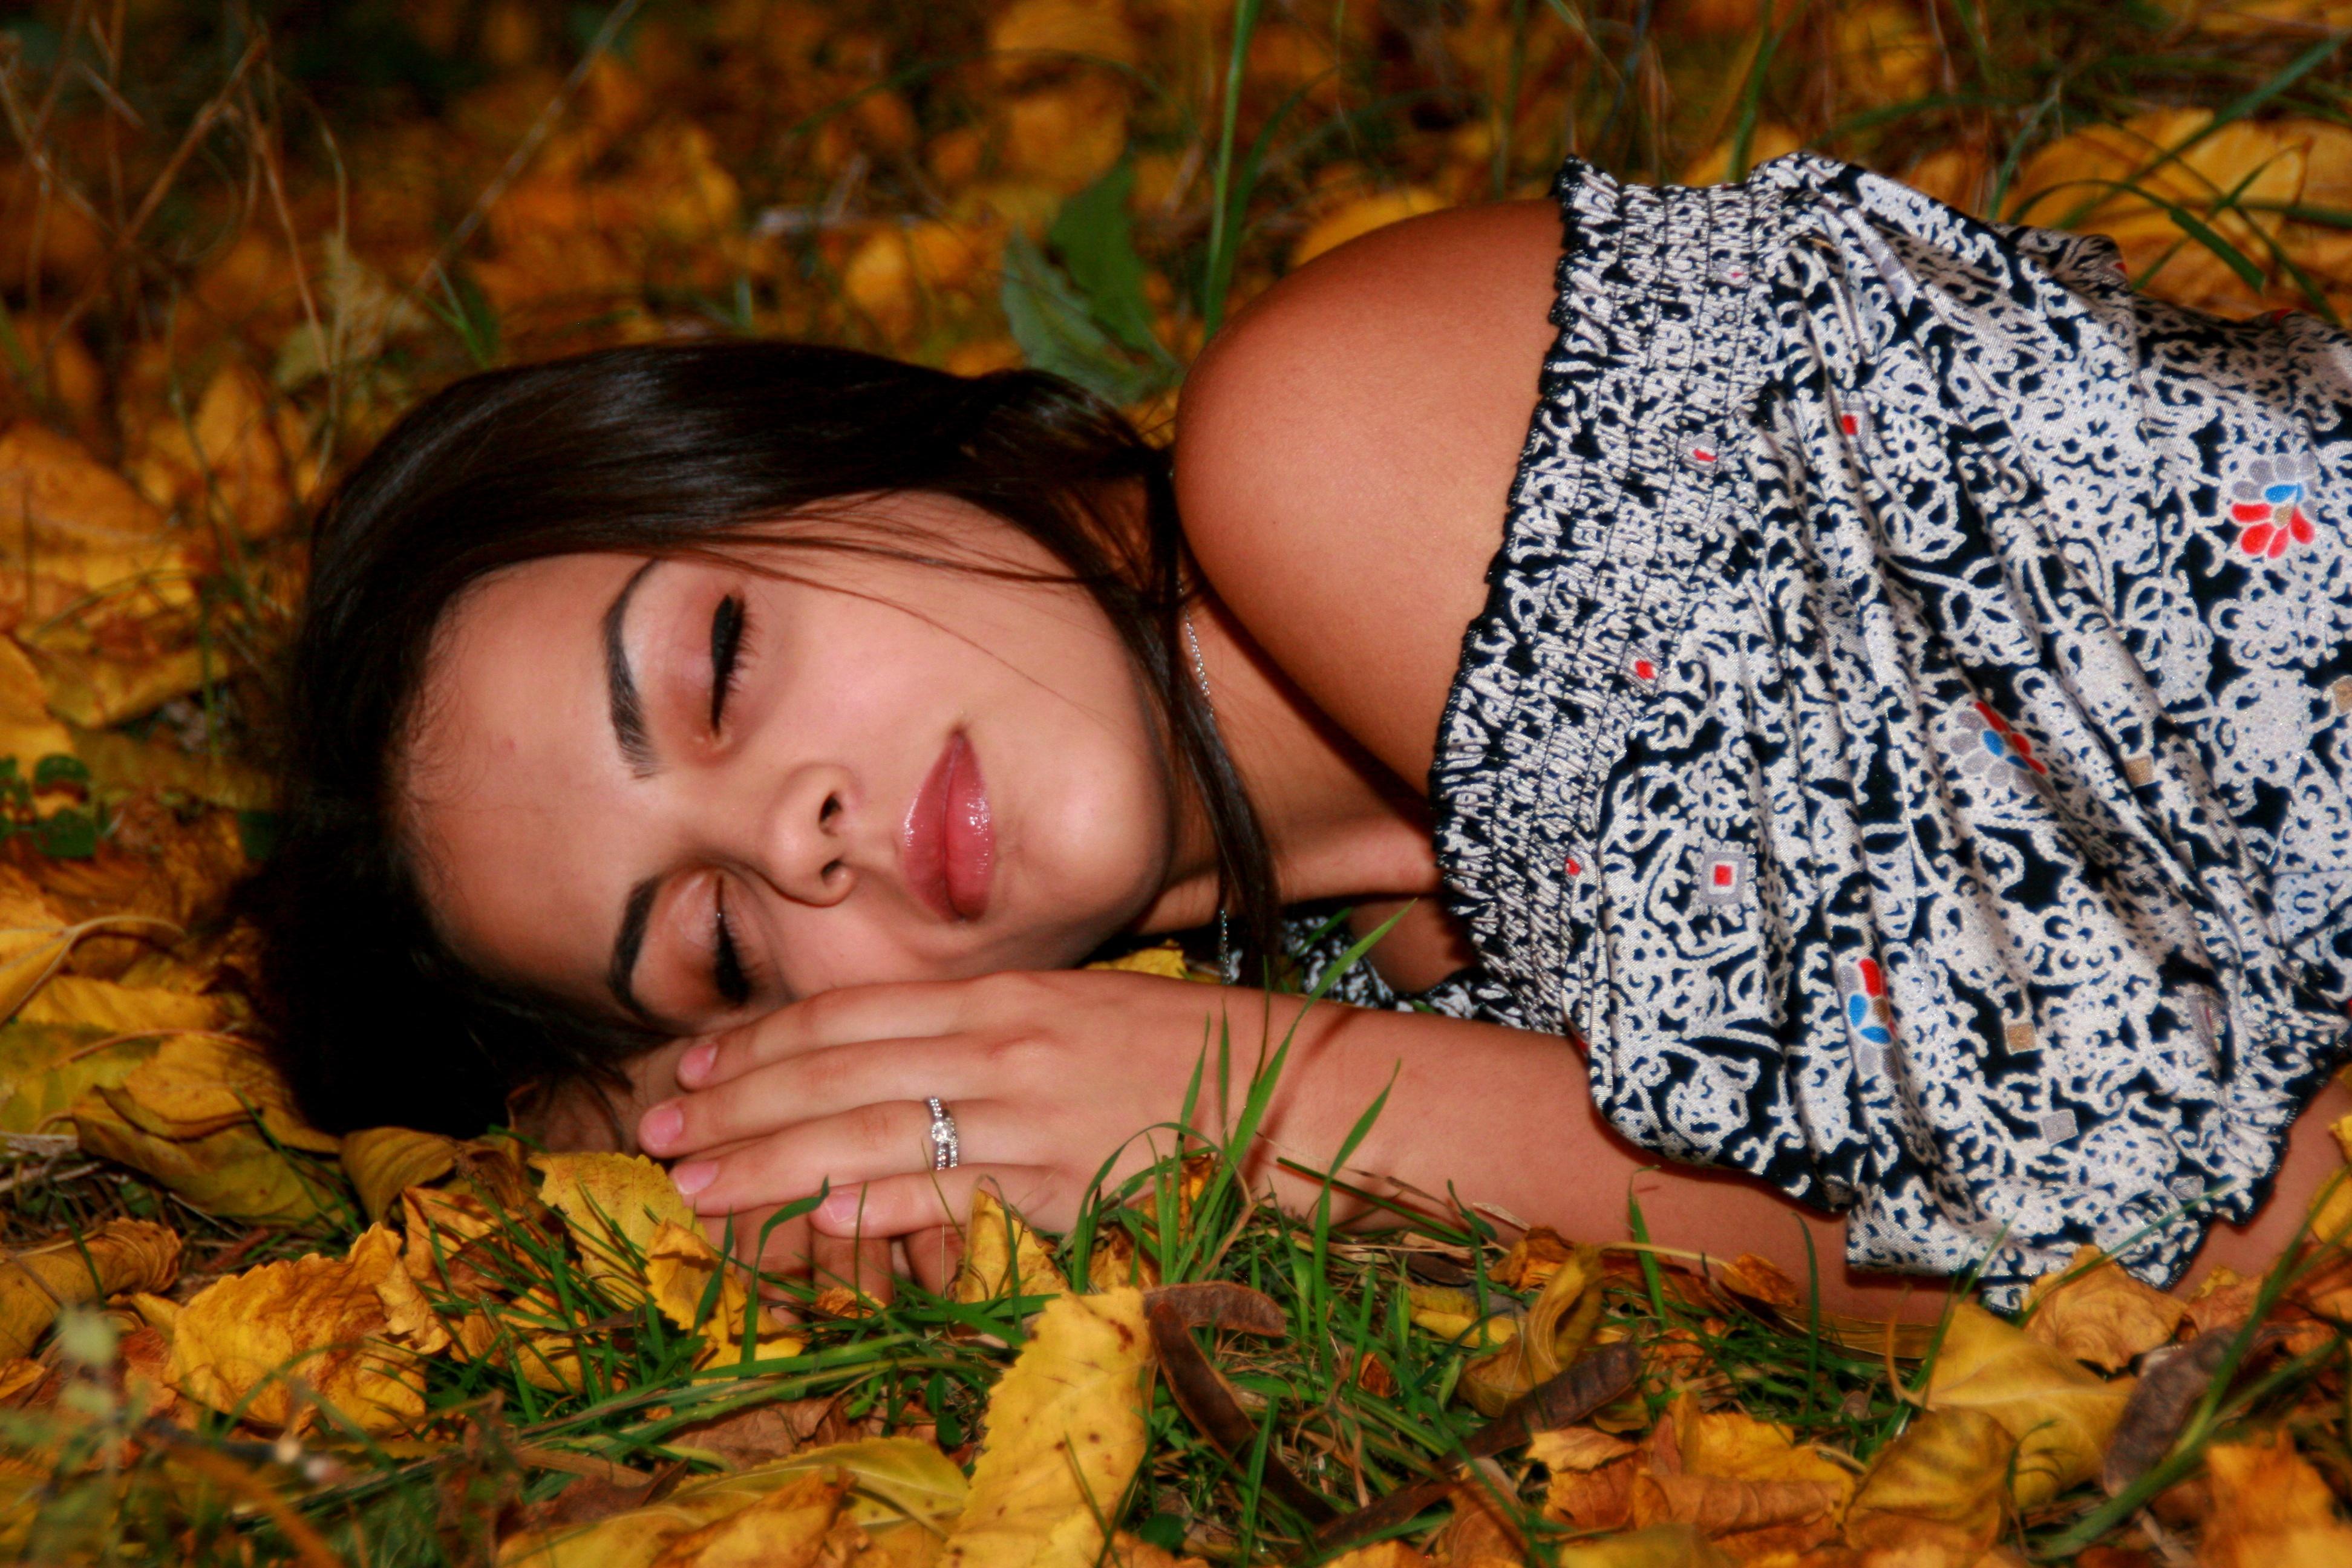 Sleeping Beauty, Activity, Beauty, Girl, Sleep, HQ Photo